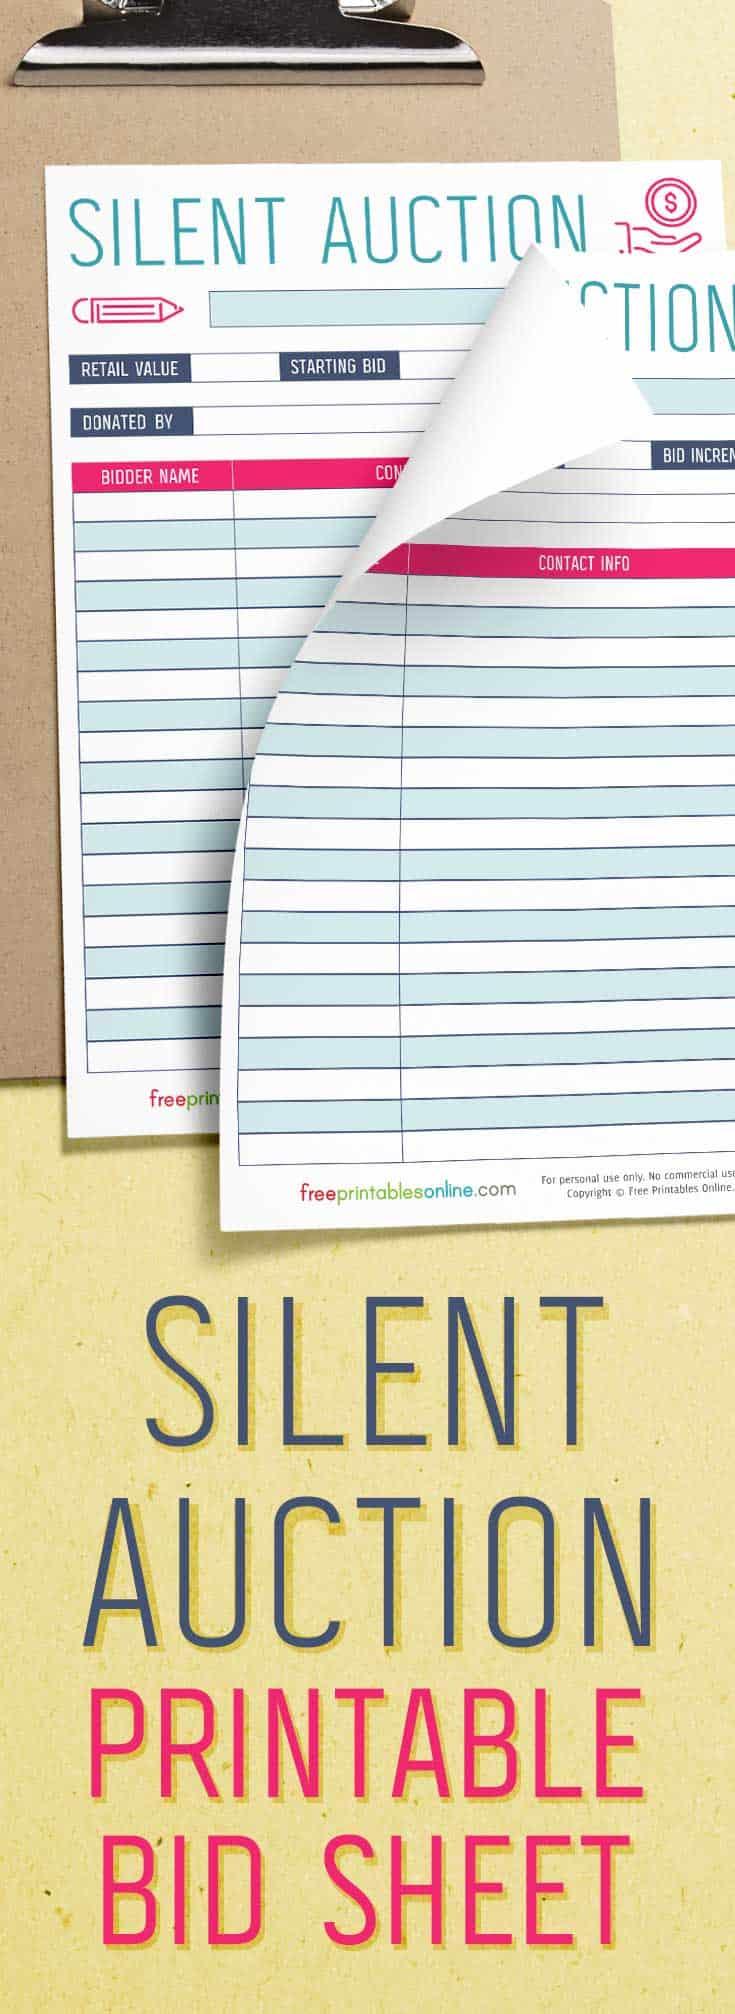 silent auction bid sheet template 30 free word excel pdf bid sheet